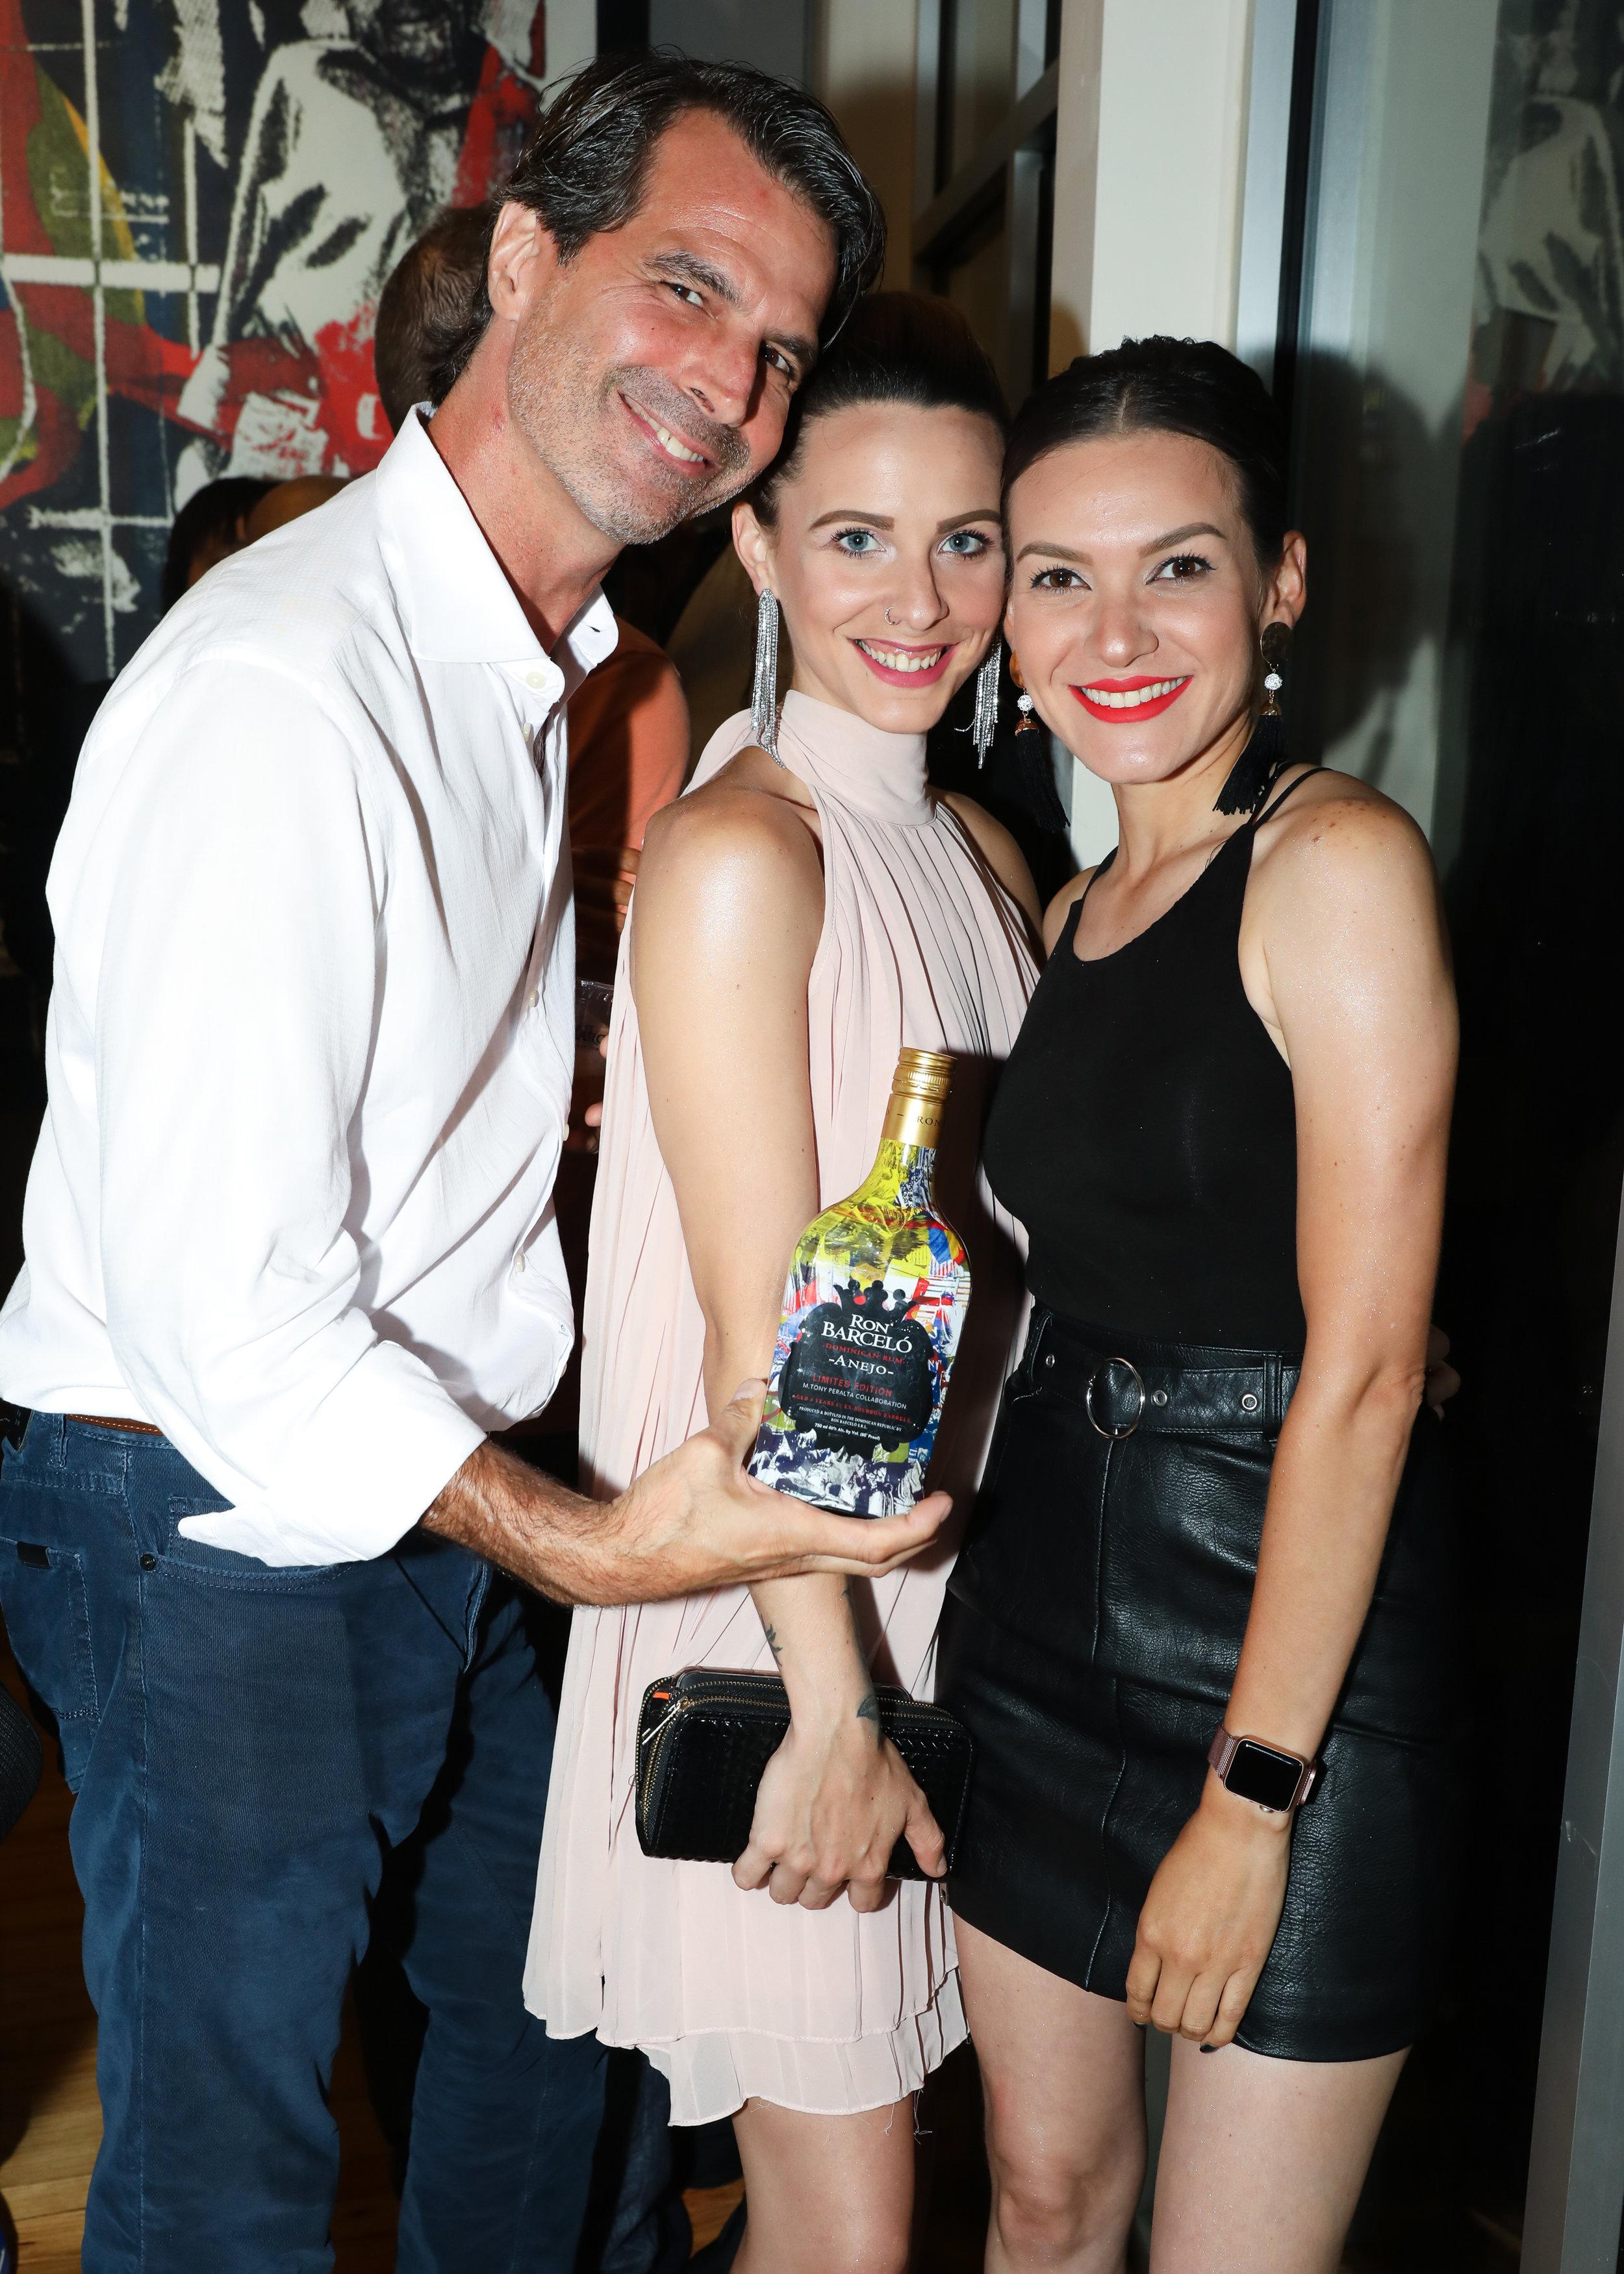 Jamie Antolini, Carolina Sentes and Dubraska Bermuz